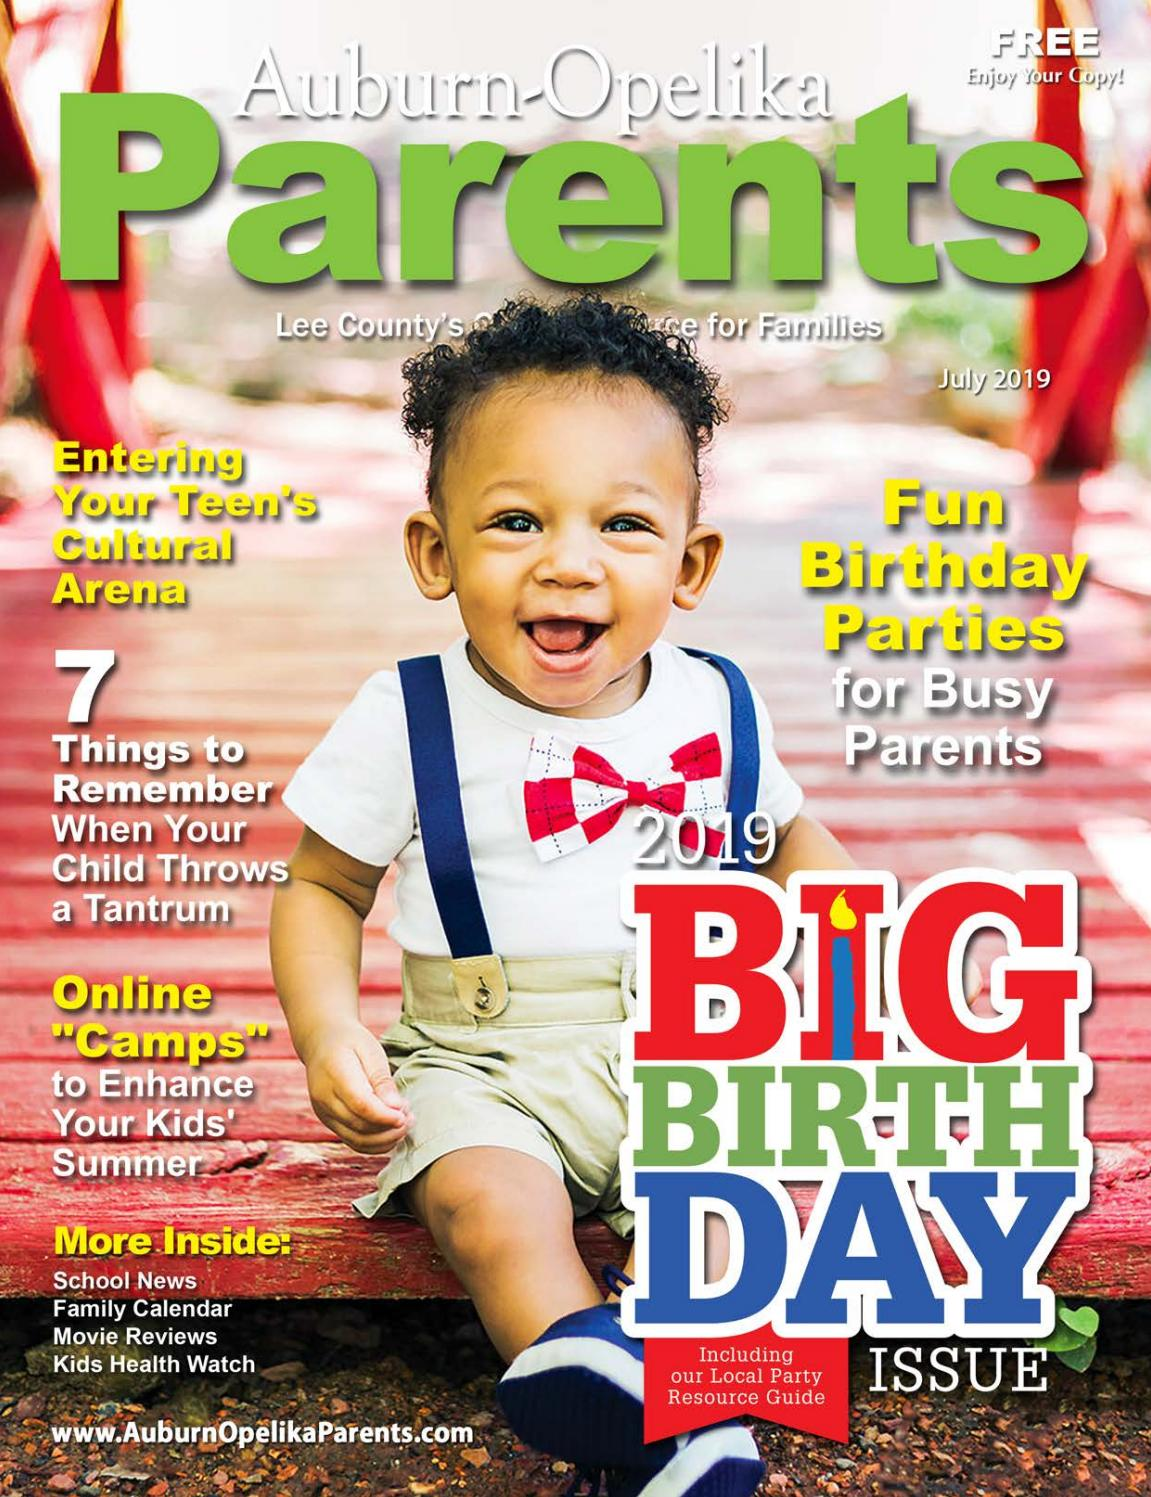 Auburn Opelika Parents July 2019 by KeepSharing - issuu